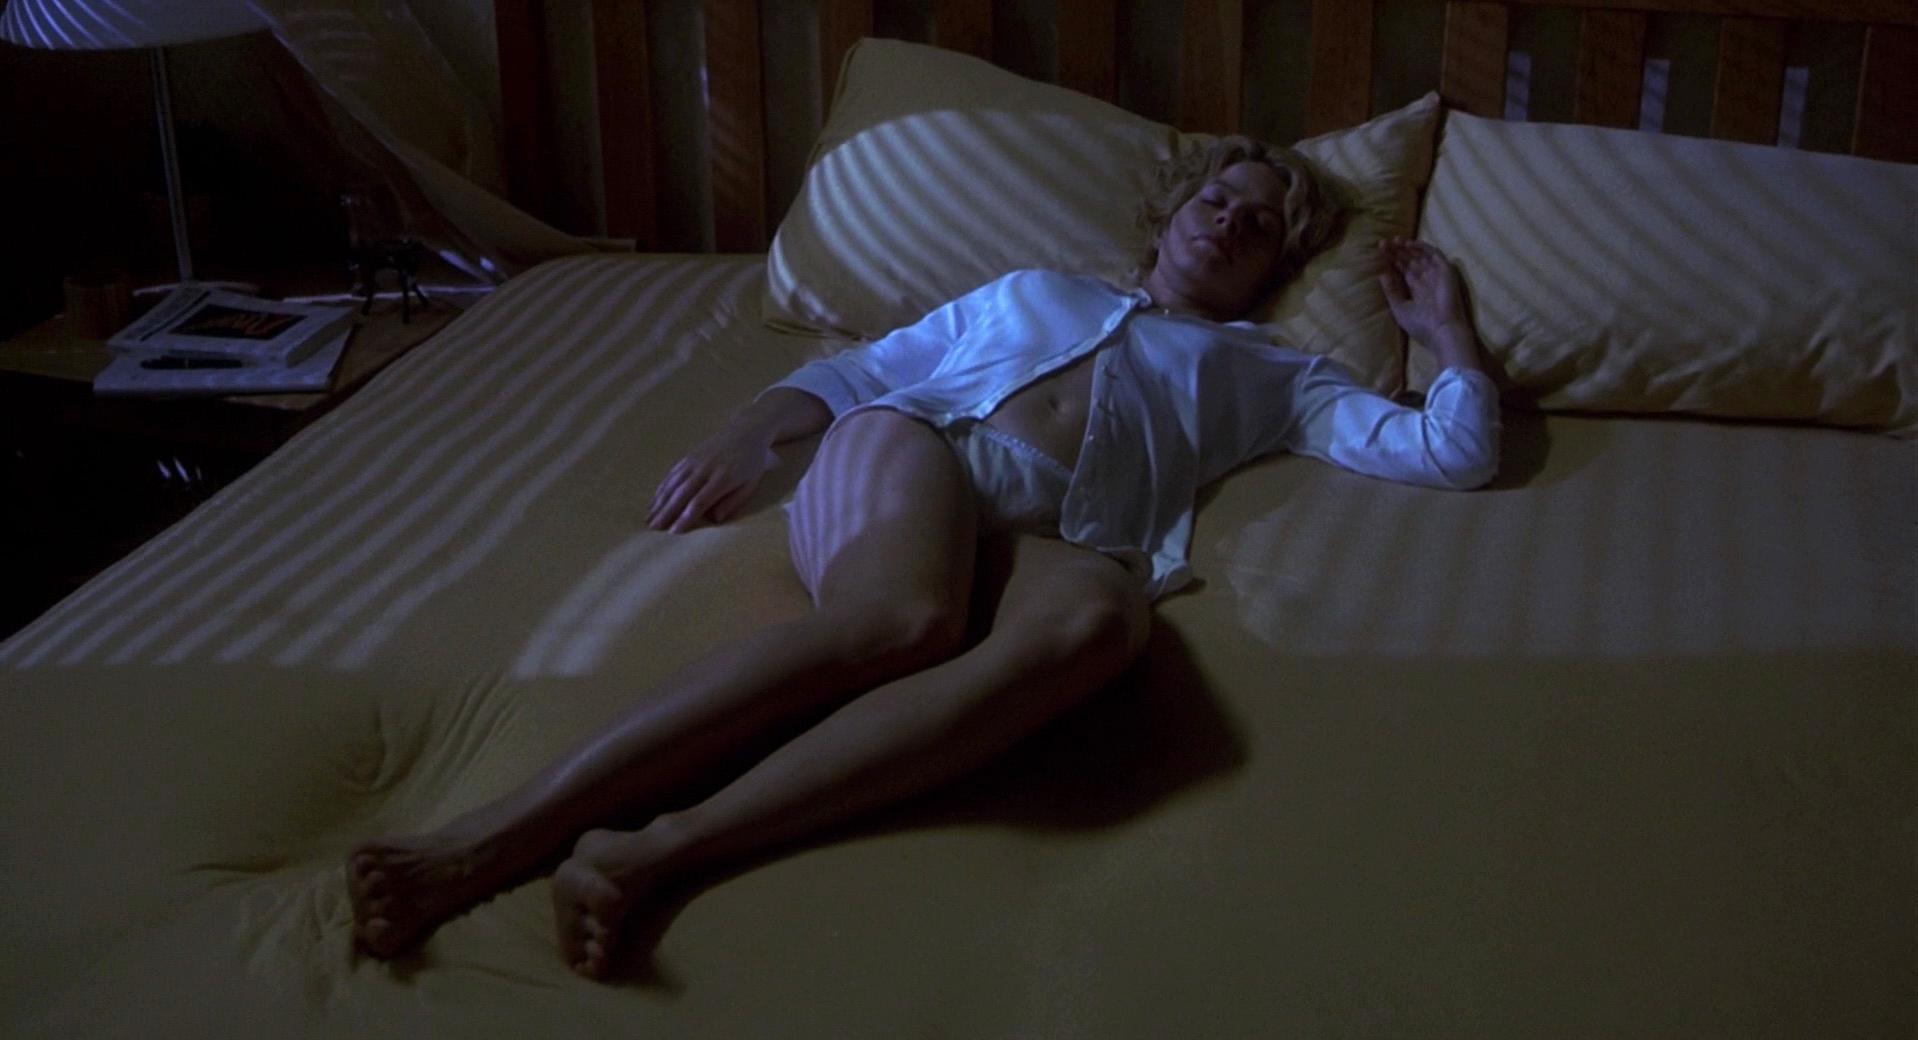 eroticheskiy-film-nevidimka-seks-dose-na-porno-aktris